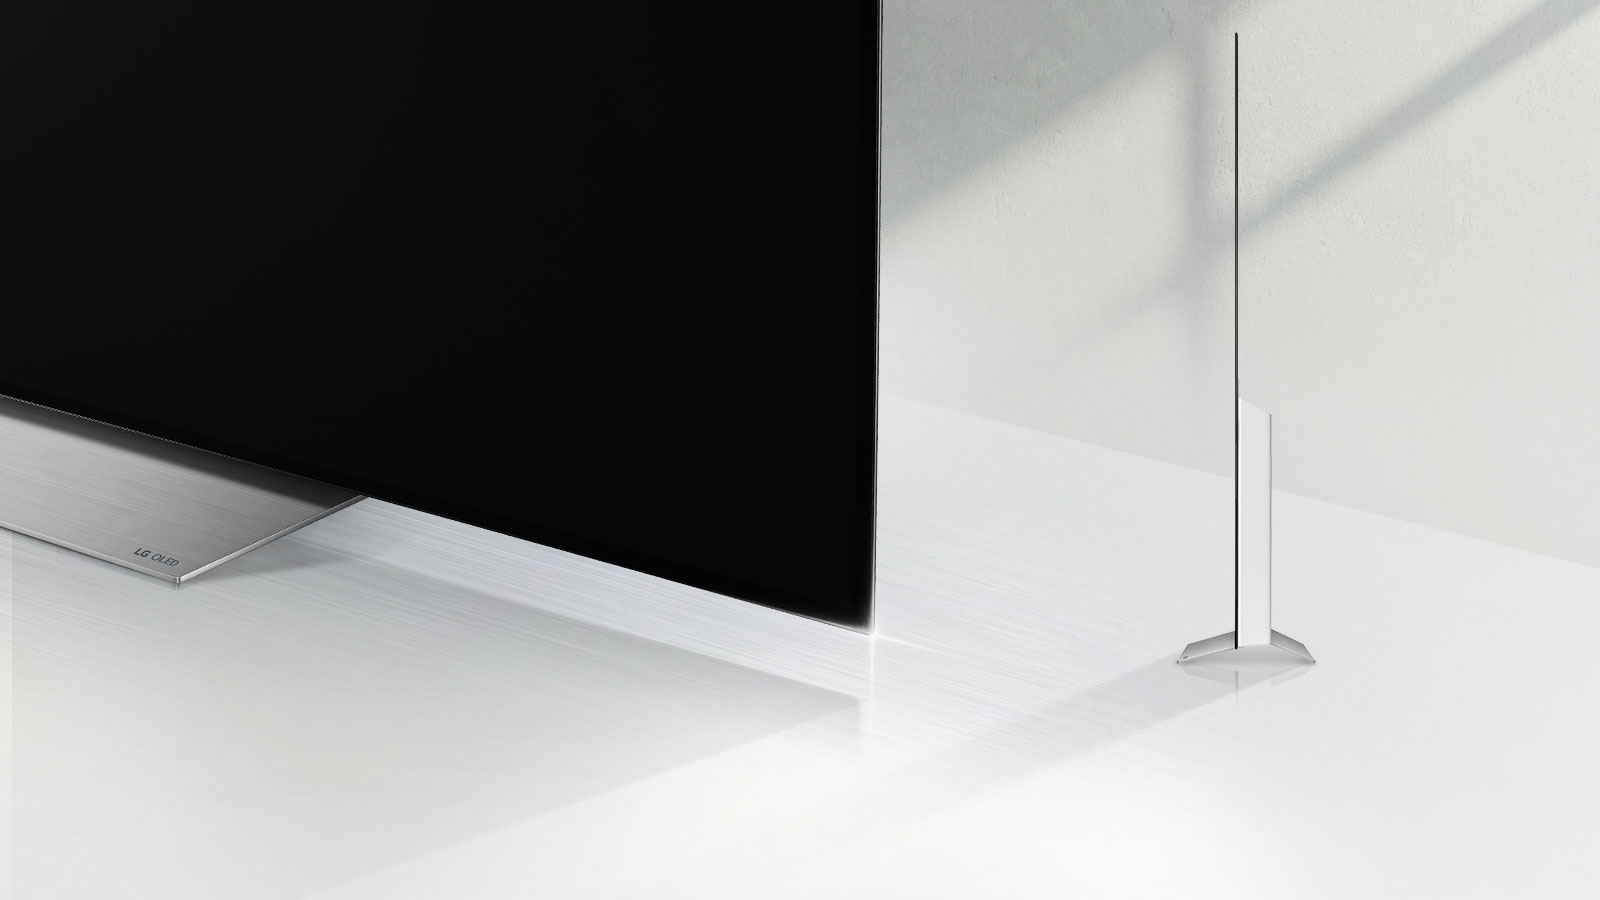 LG OLED C7 (OLED55C7, OLED65C7)